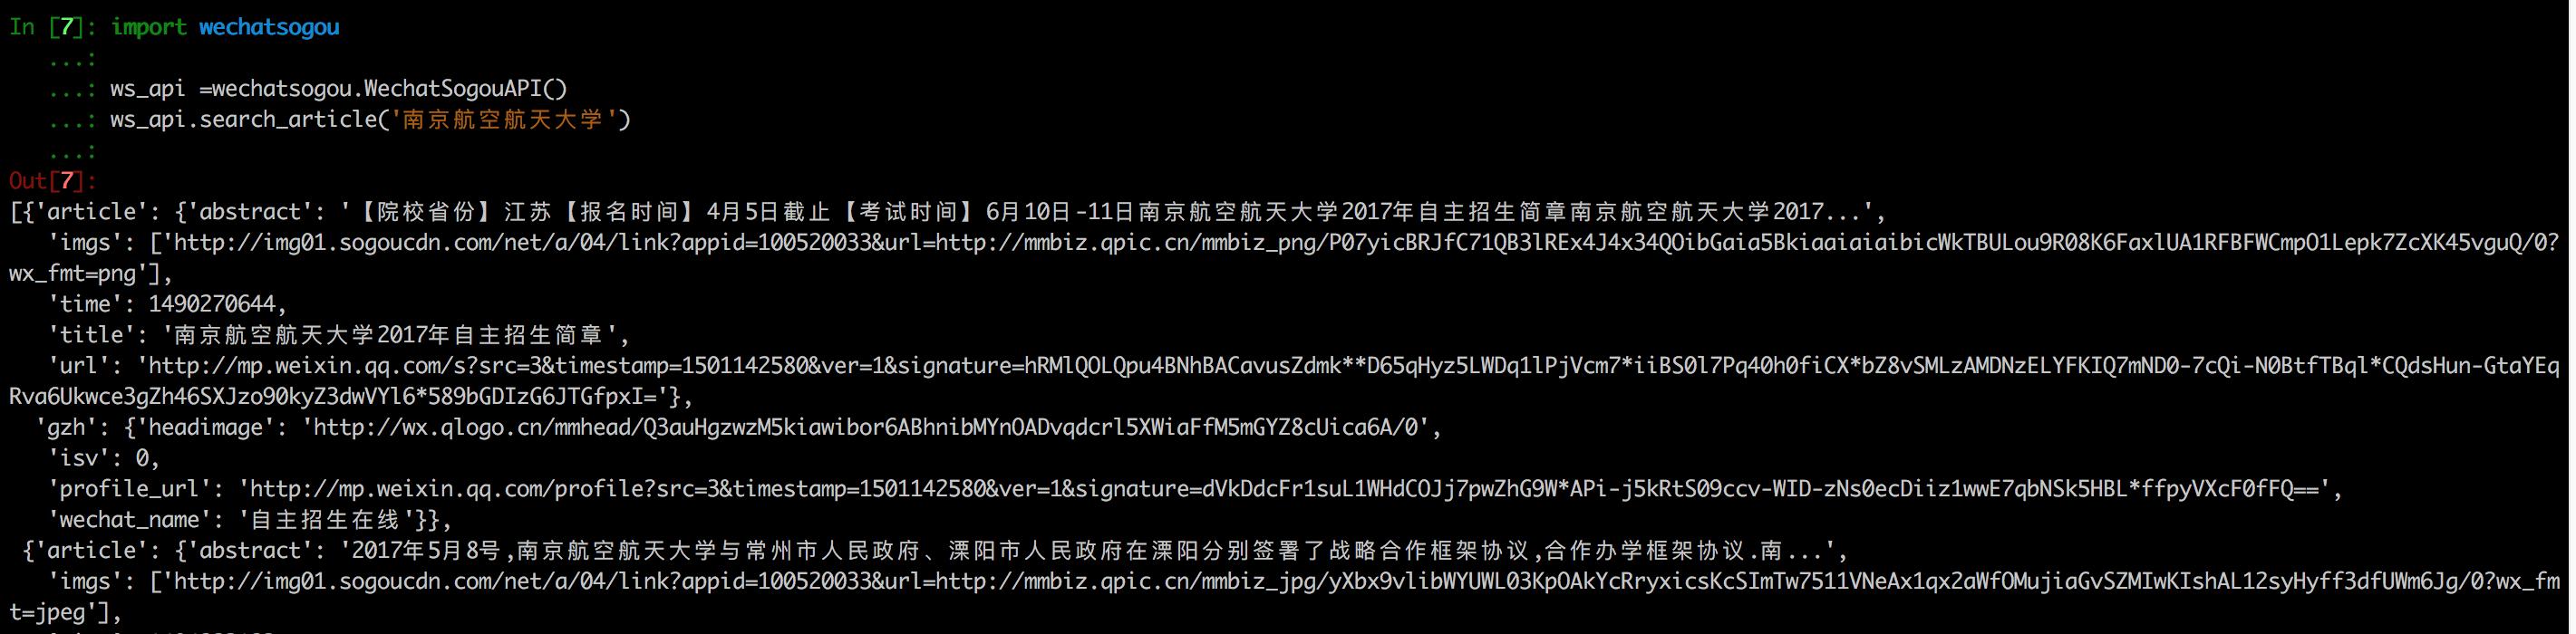 ws_api.search_article('南京航空航天大学')